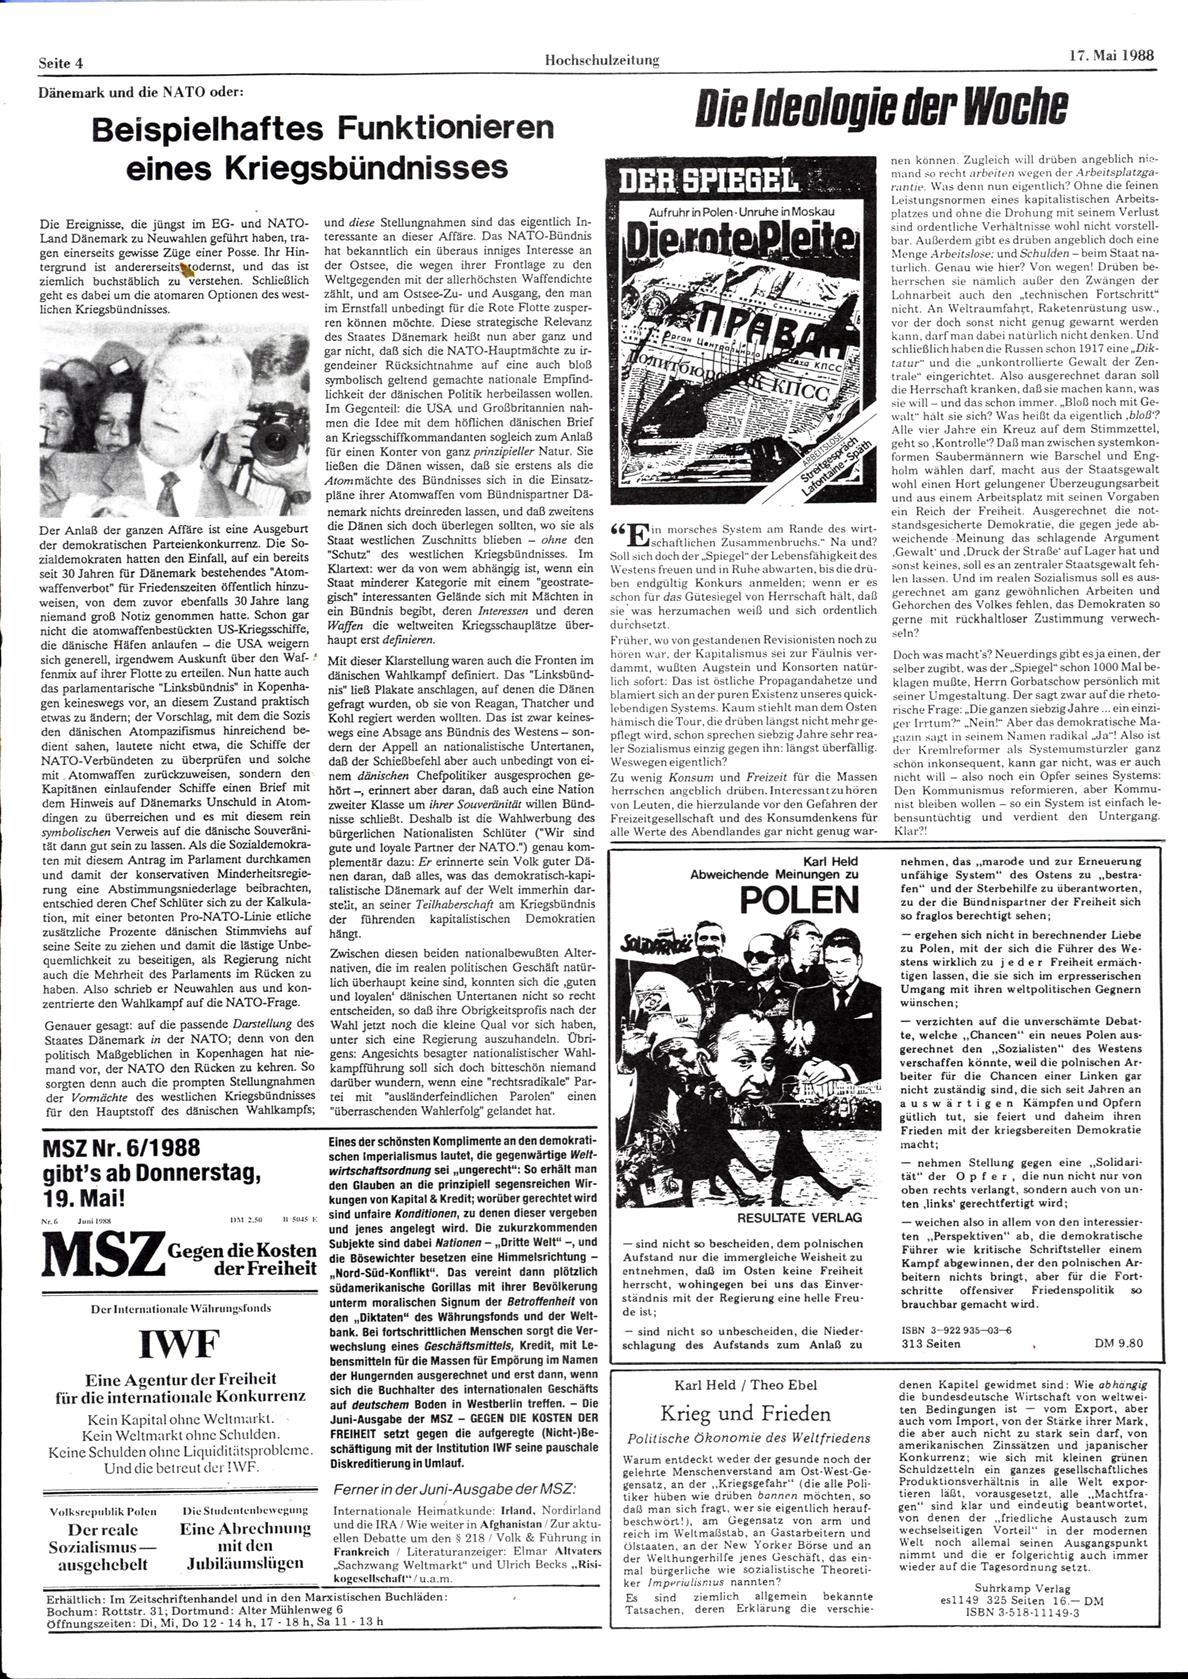 Bochum_BHZ_19880517_169_004